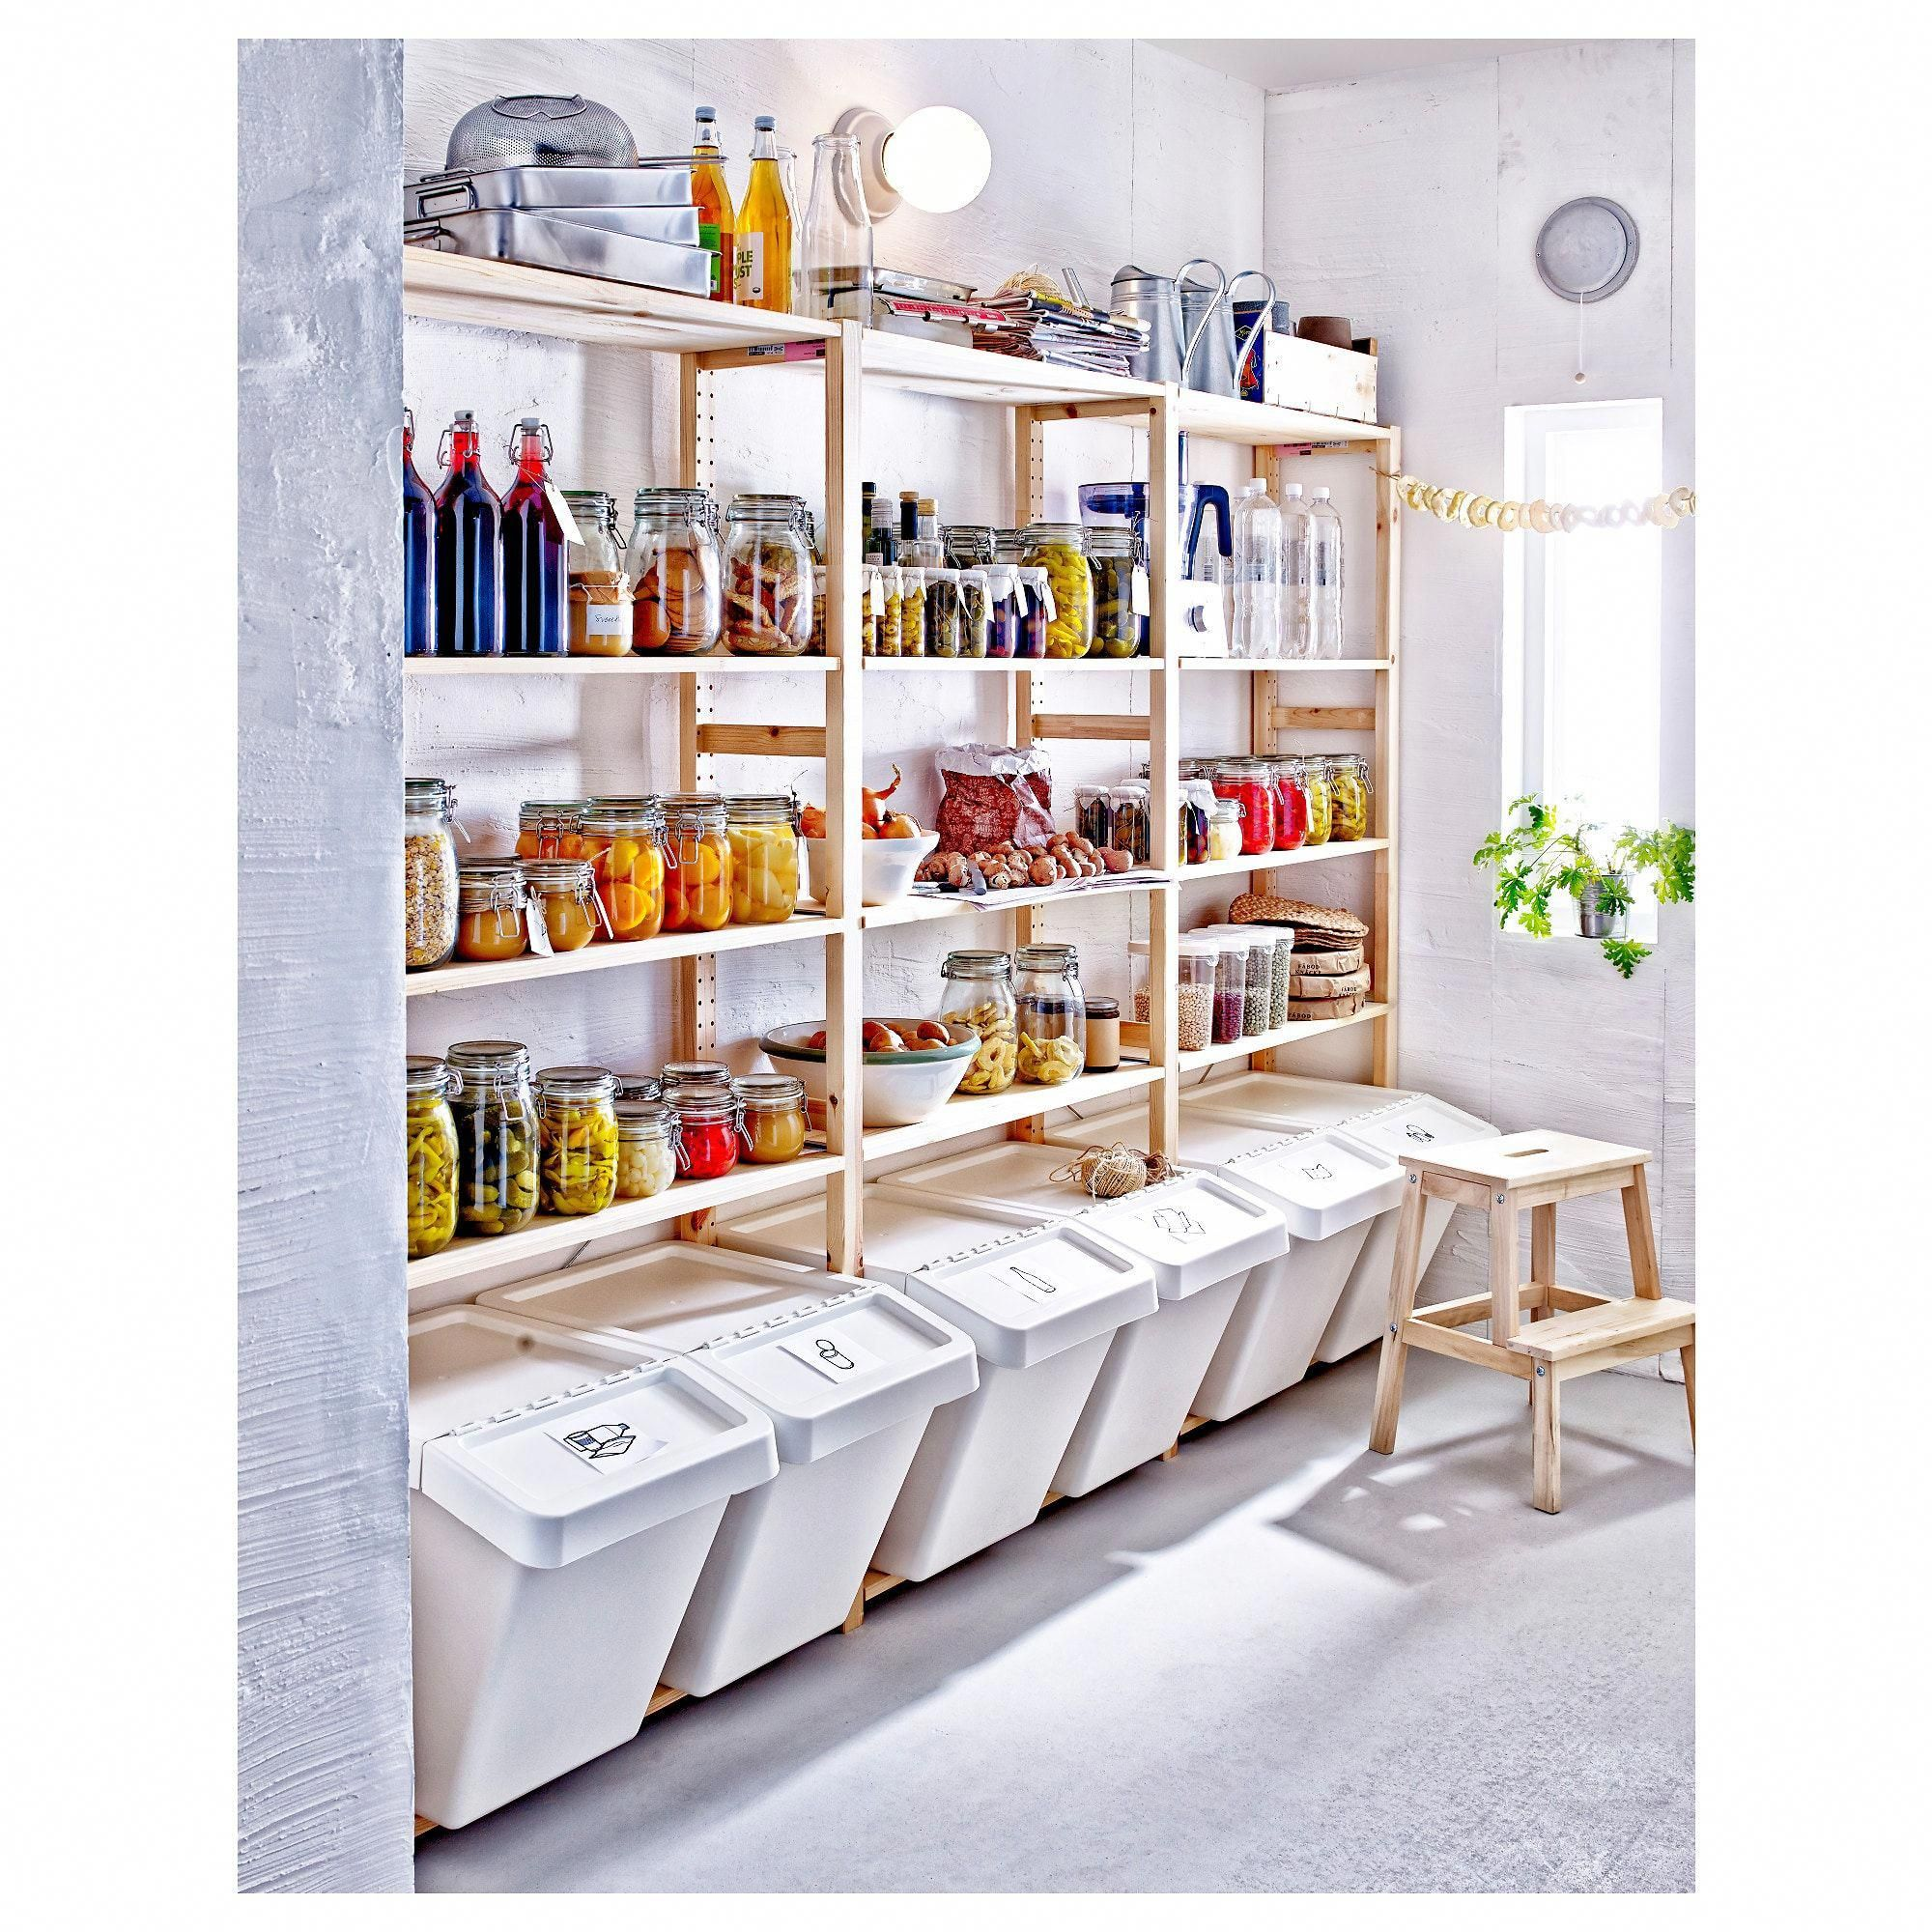 Ivar Shelving Unit Pine 35x19 5 8x70 1 2 In 2020 Pantry Design Kitchen Pantry Design Glass Shelves Kitchen